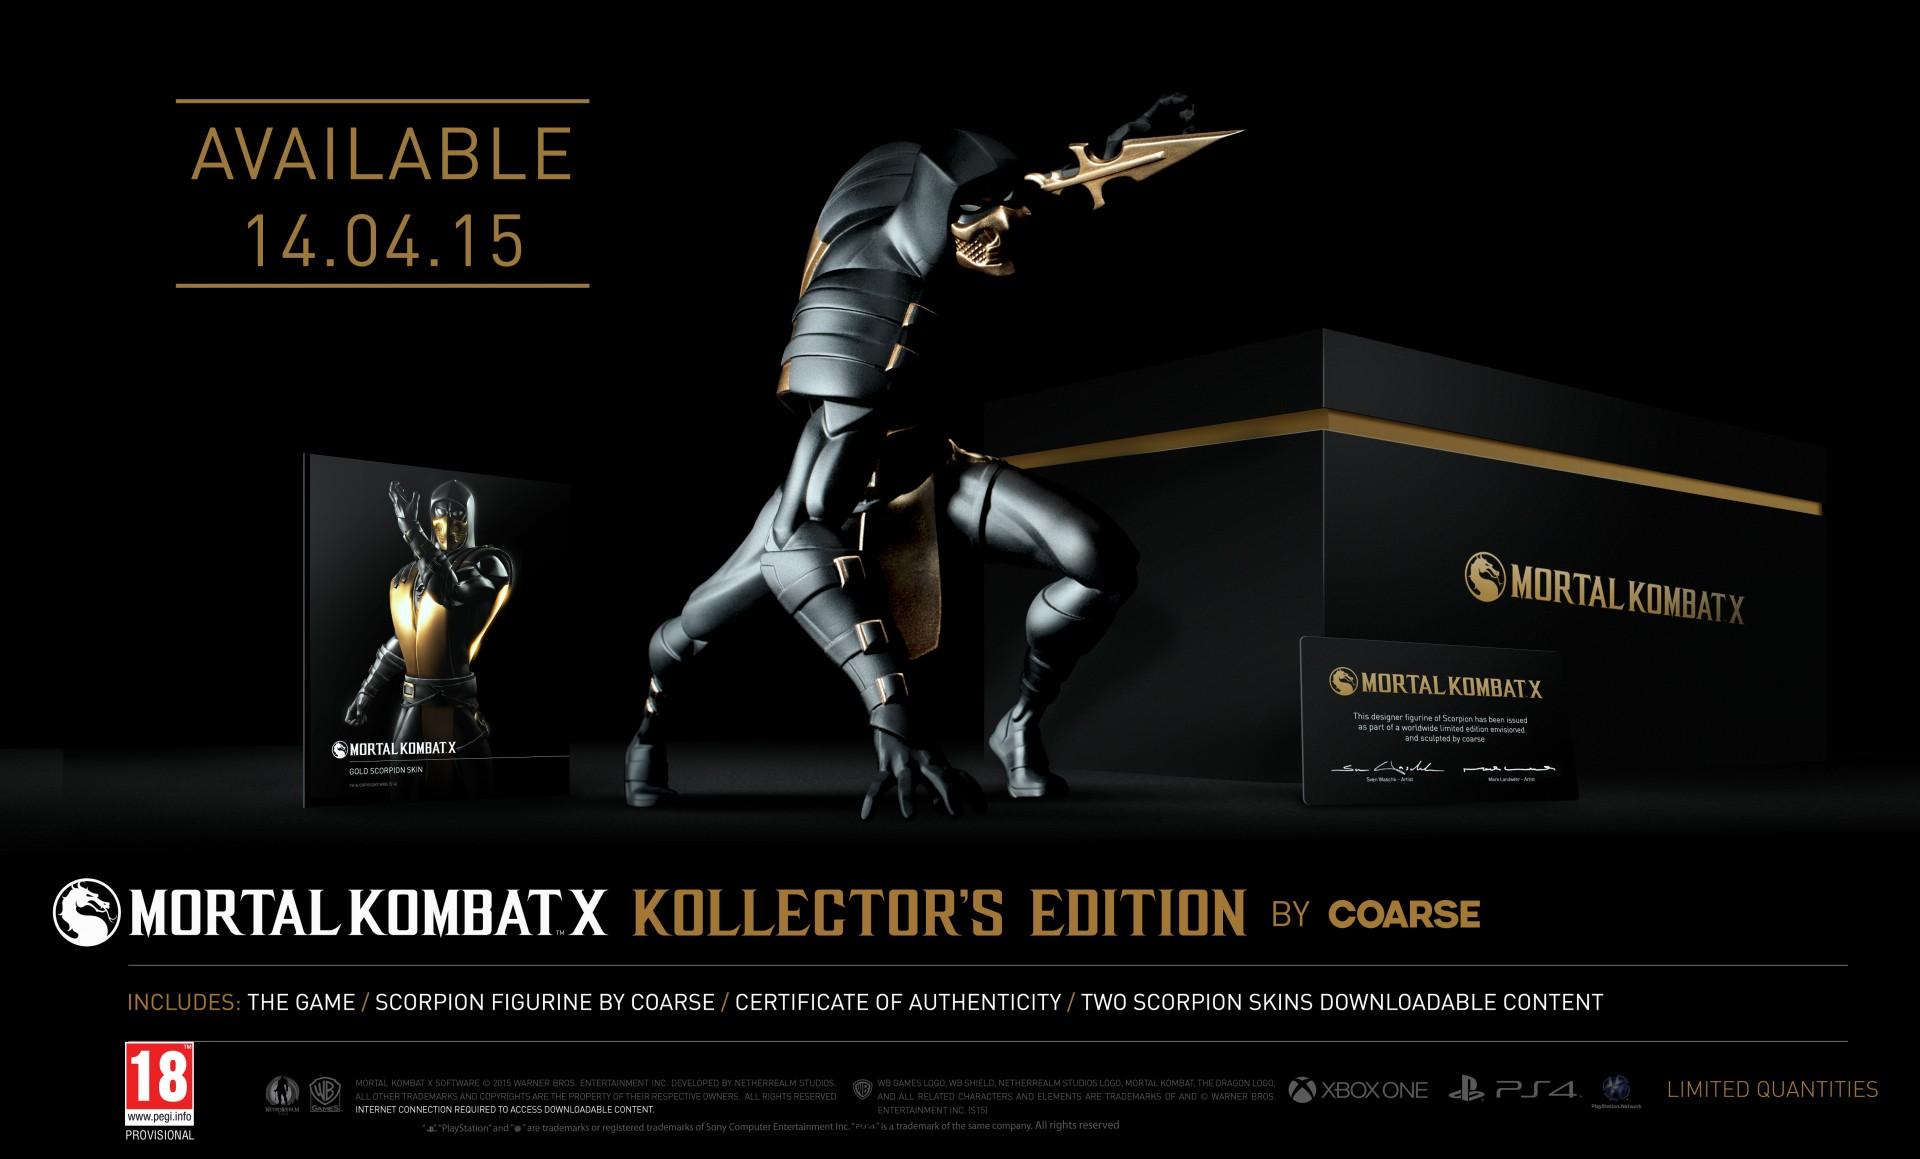 mortal-kombat-x-kollectors-edition-scorpion-figurine-by-coarse